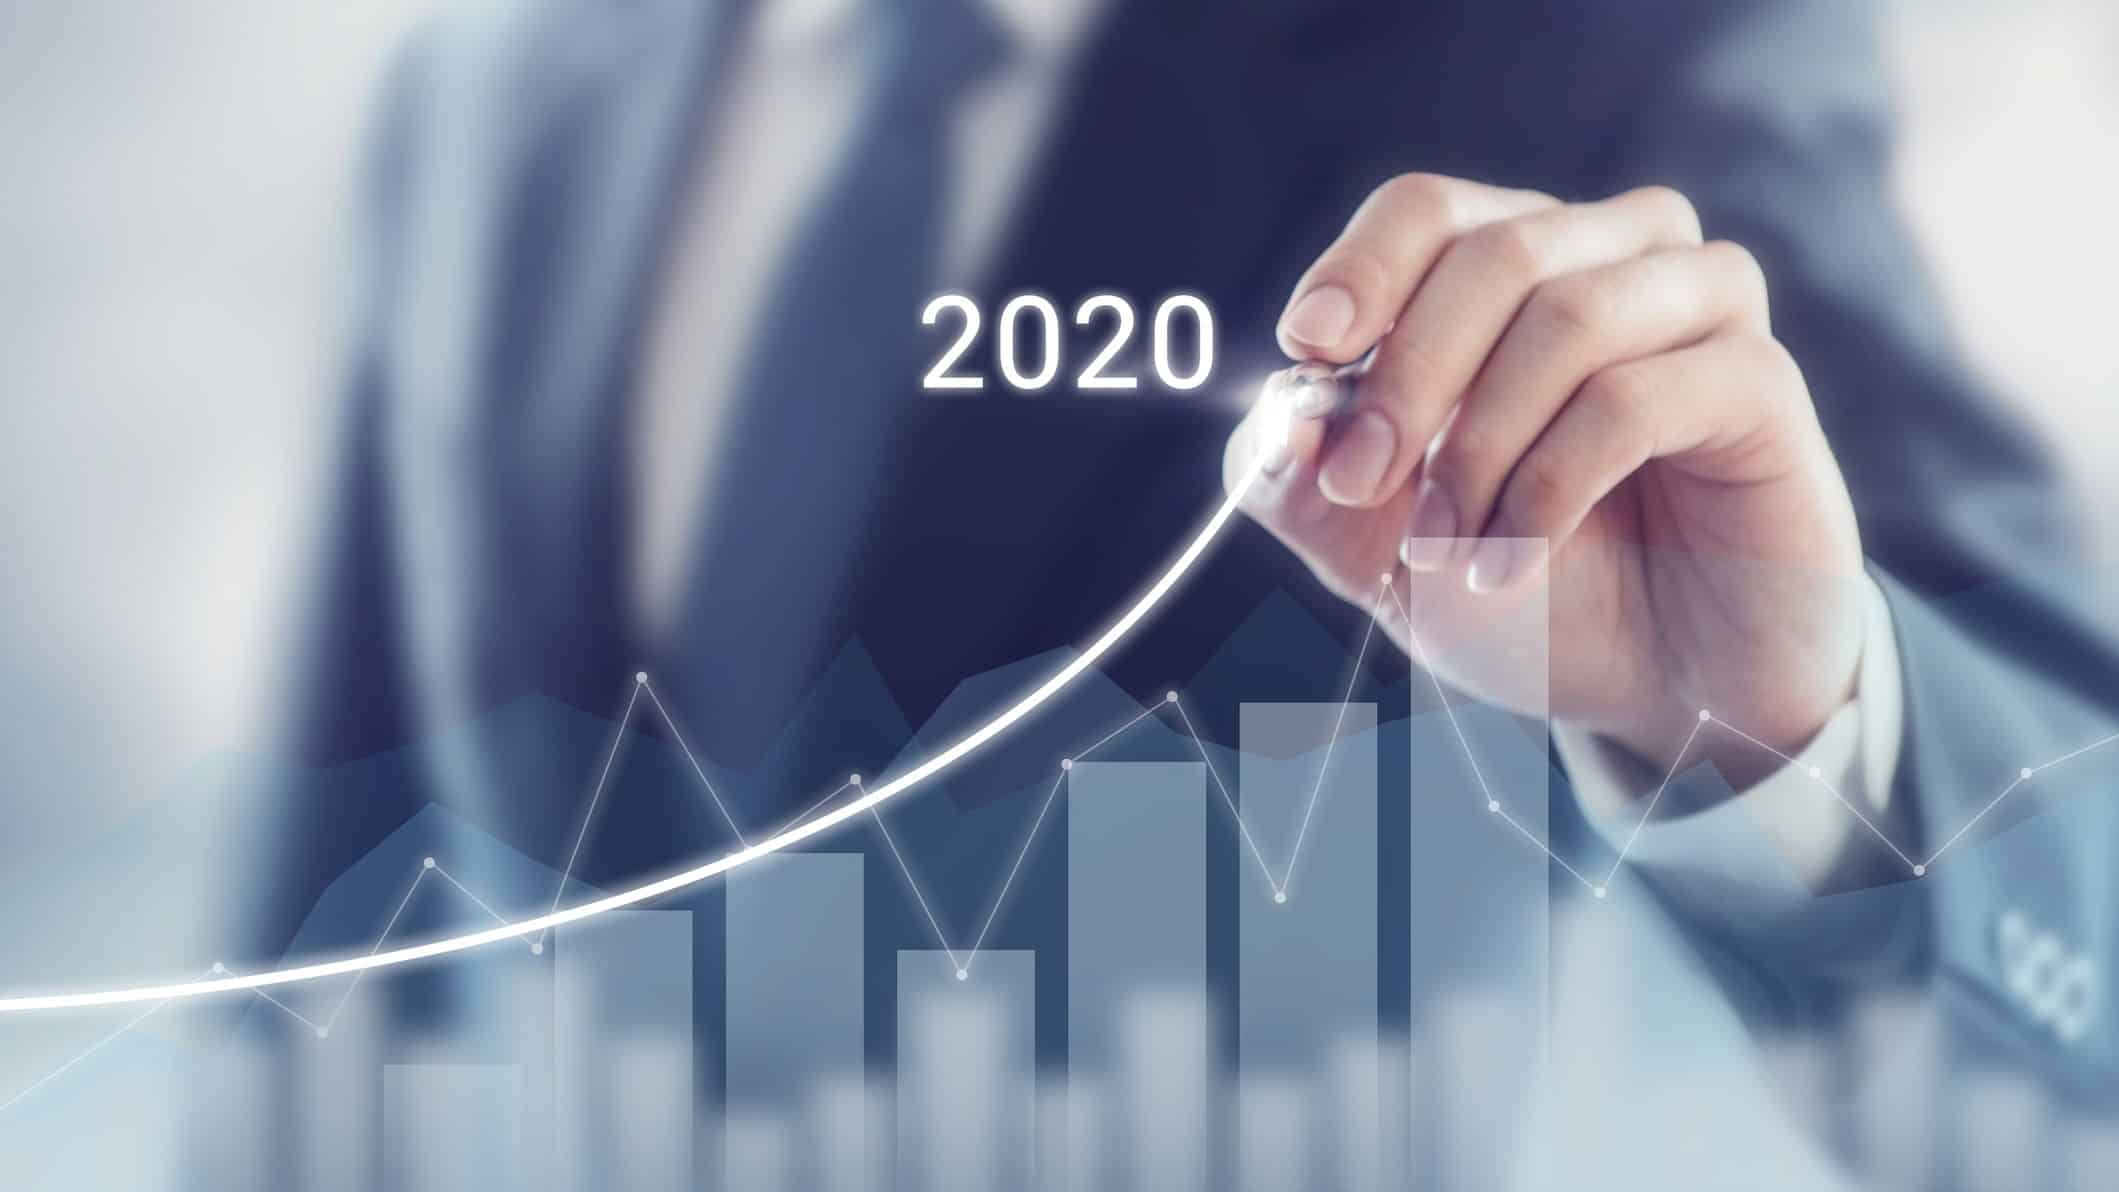 man drawing upward curve on 2020 graph, asx share price growth